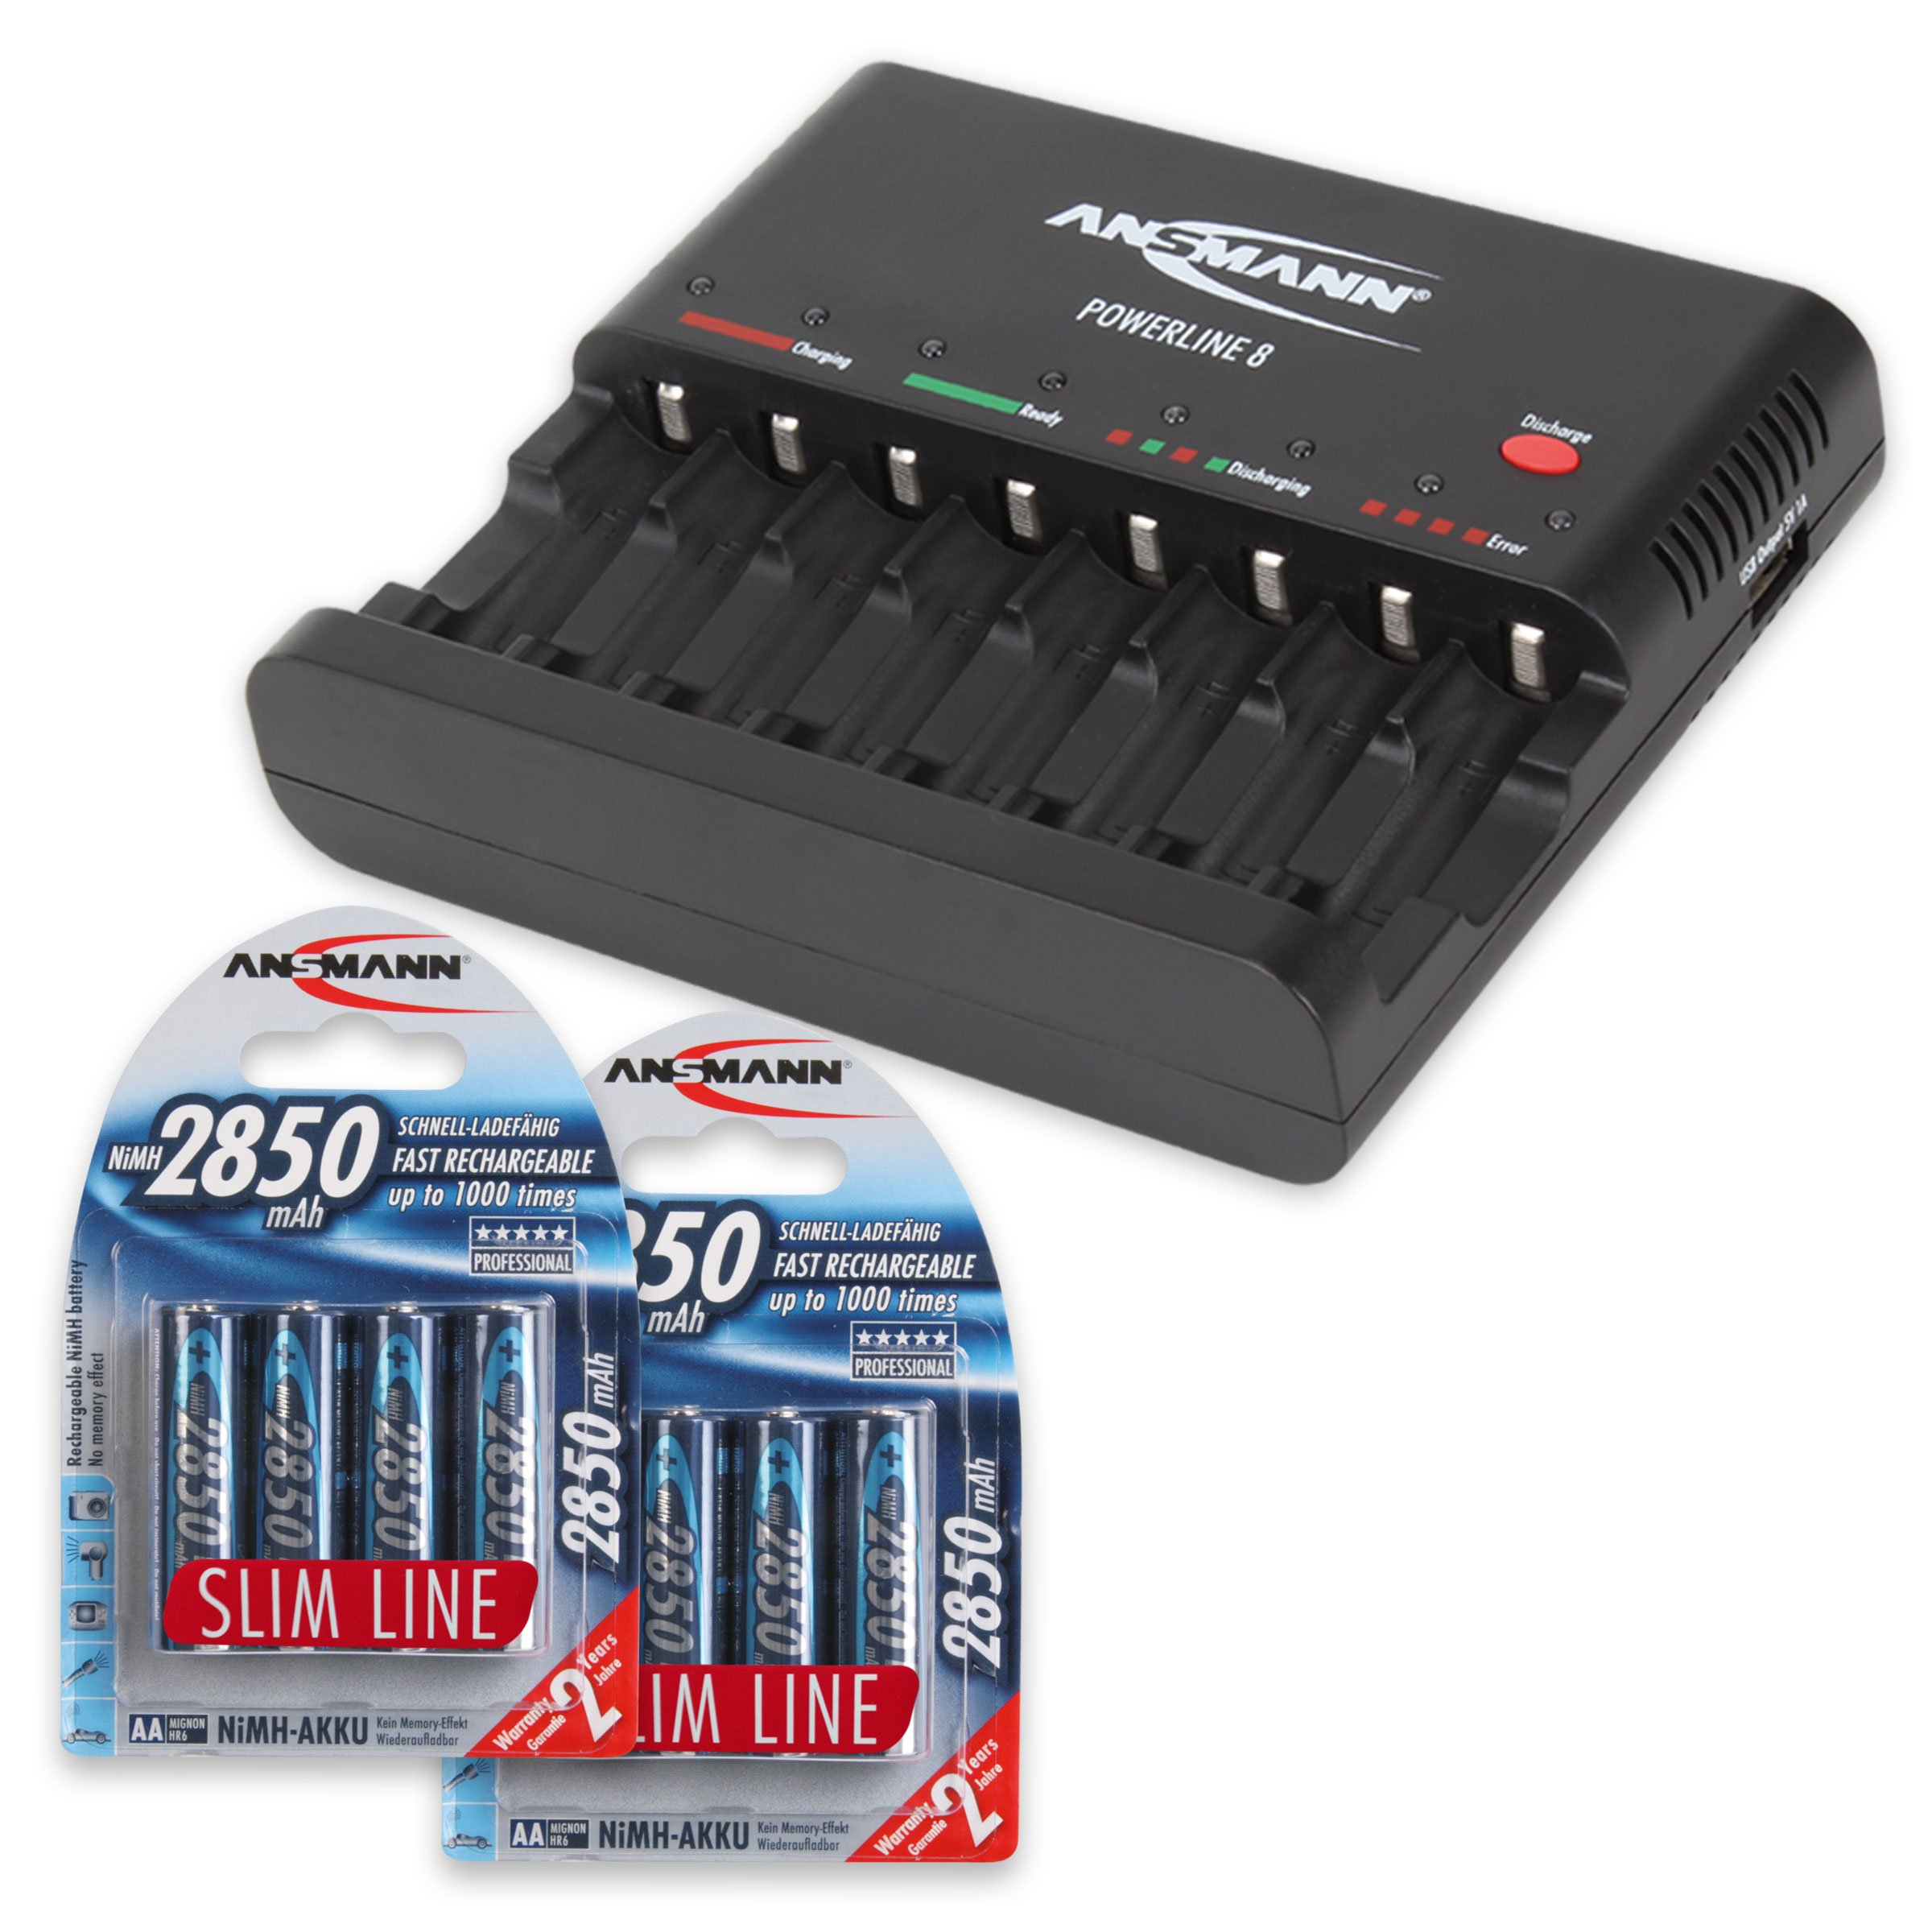 Ansmann 1001-0006-US-590-2 ANSMANN Powerline 8 AAA & AA Smart Battery Charger AA, AAA Rechargeable Batteries w. Discharge Function USB-Port + Eight 2850mAh Slimline AA Batteries